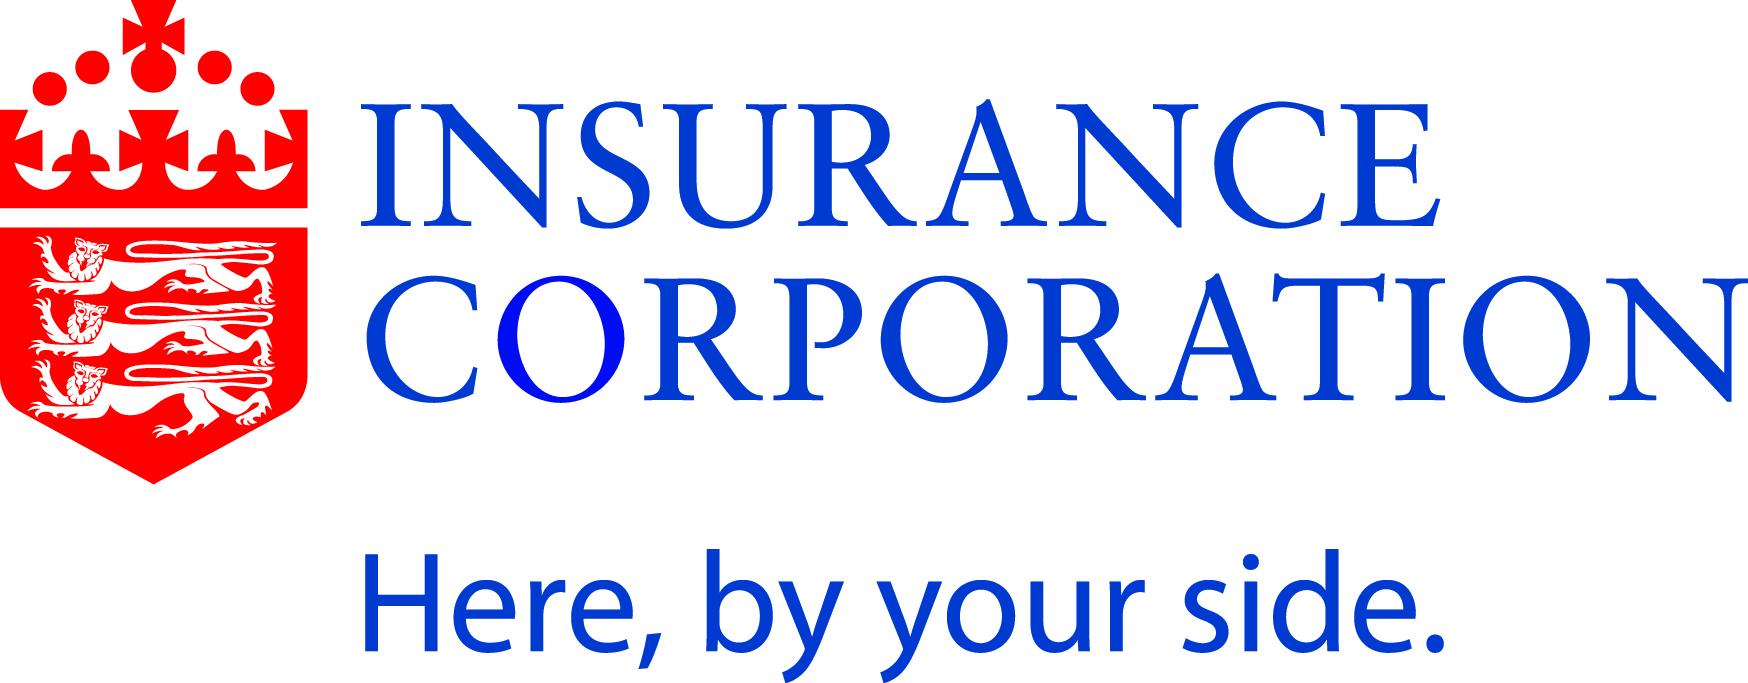 Insurance Corporation logo